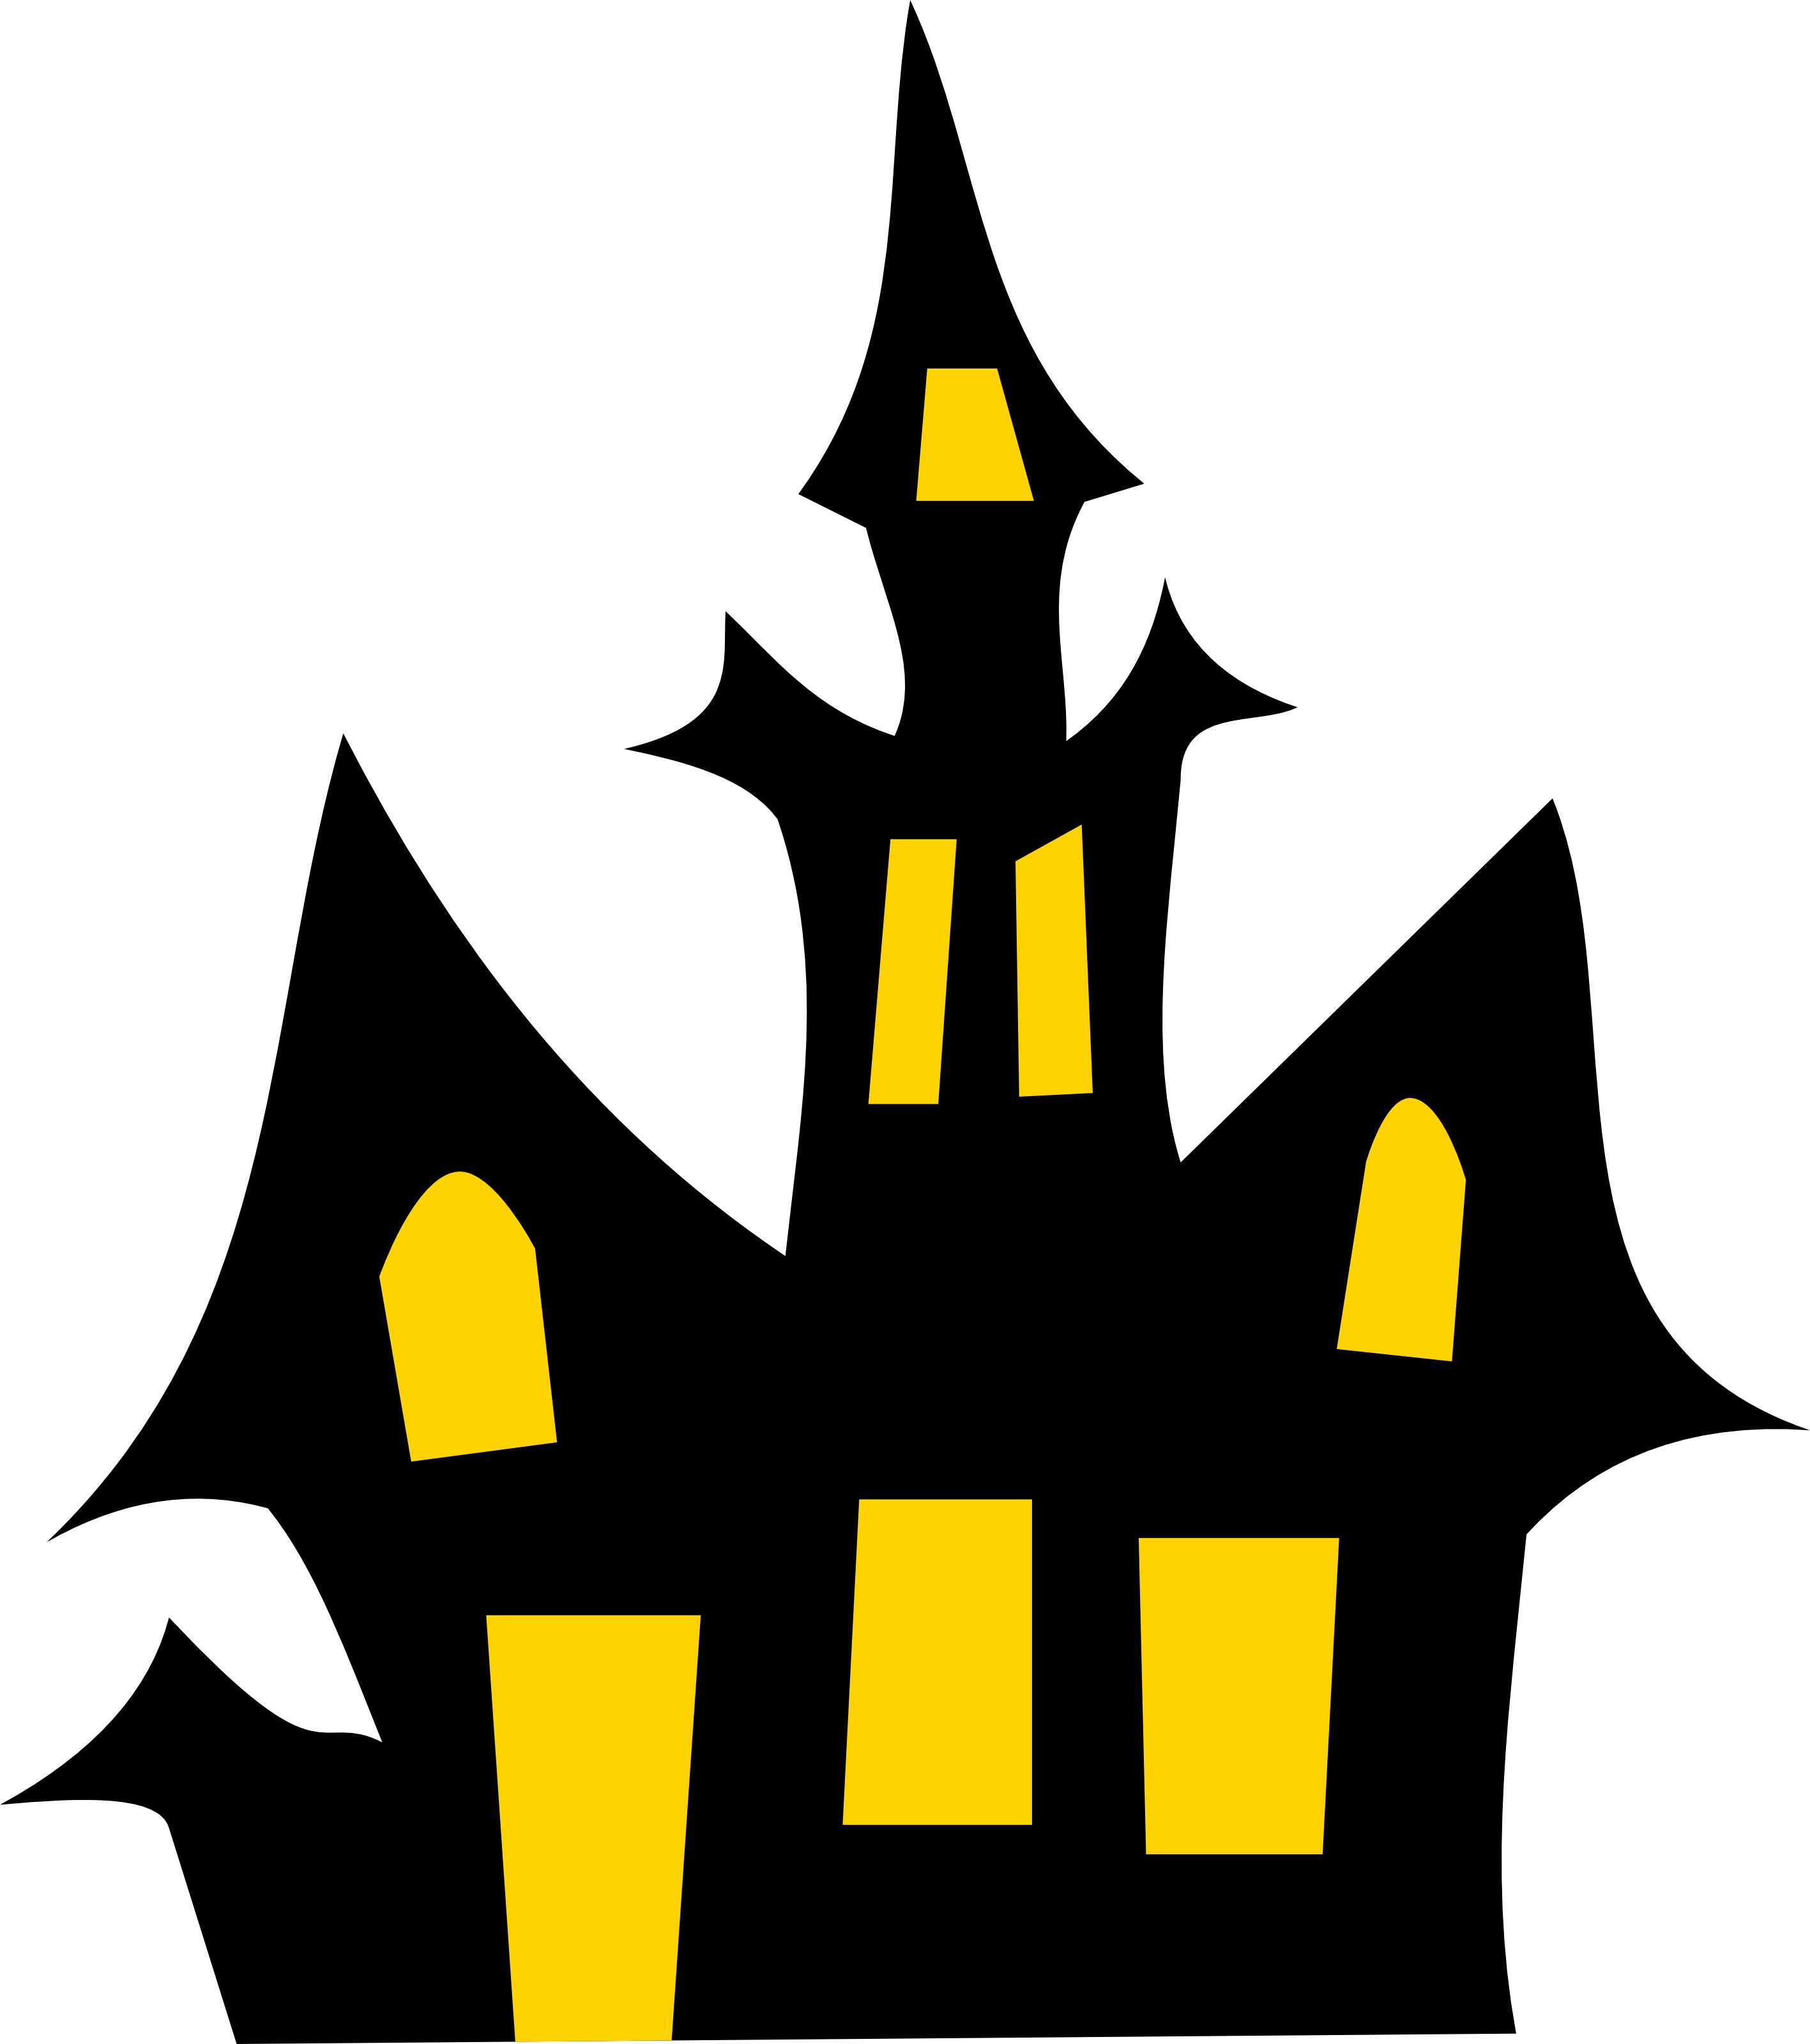 free vector halloween clipart - photo #14